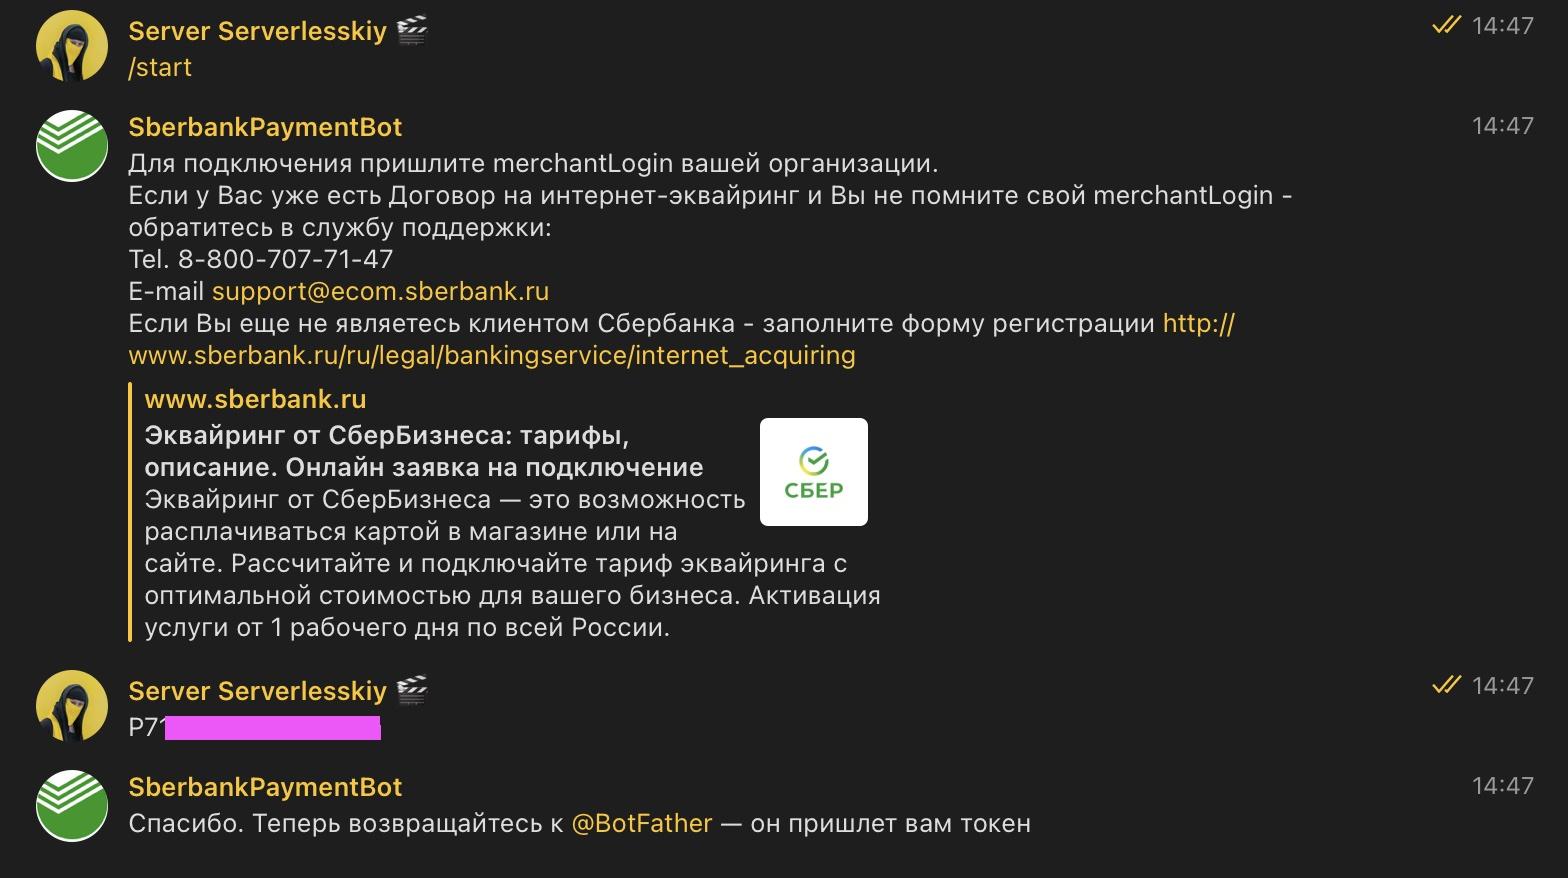 SberbankPaymentBot